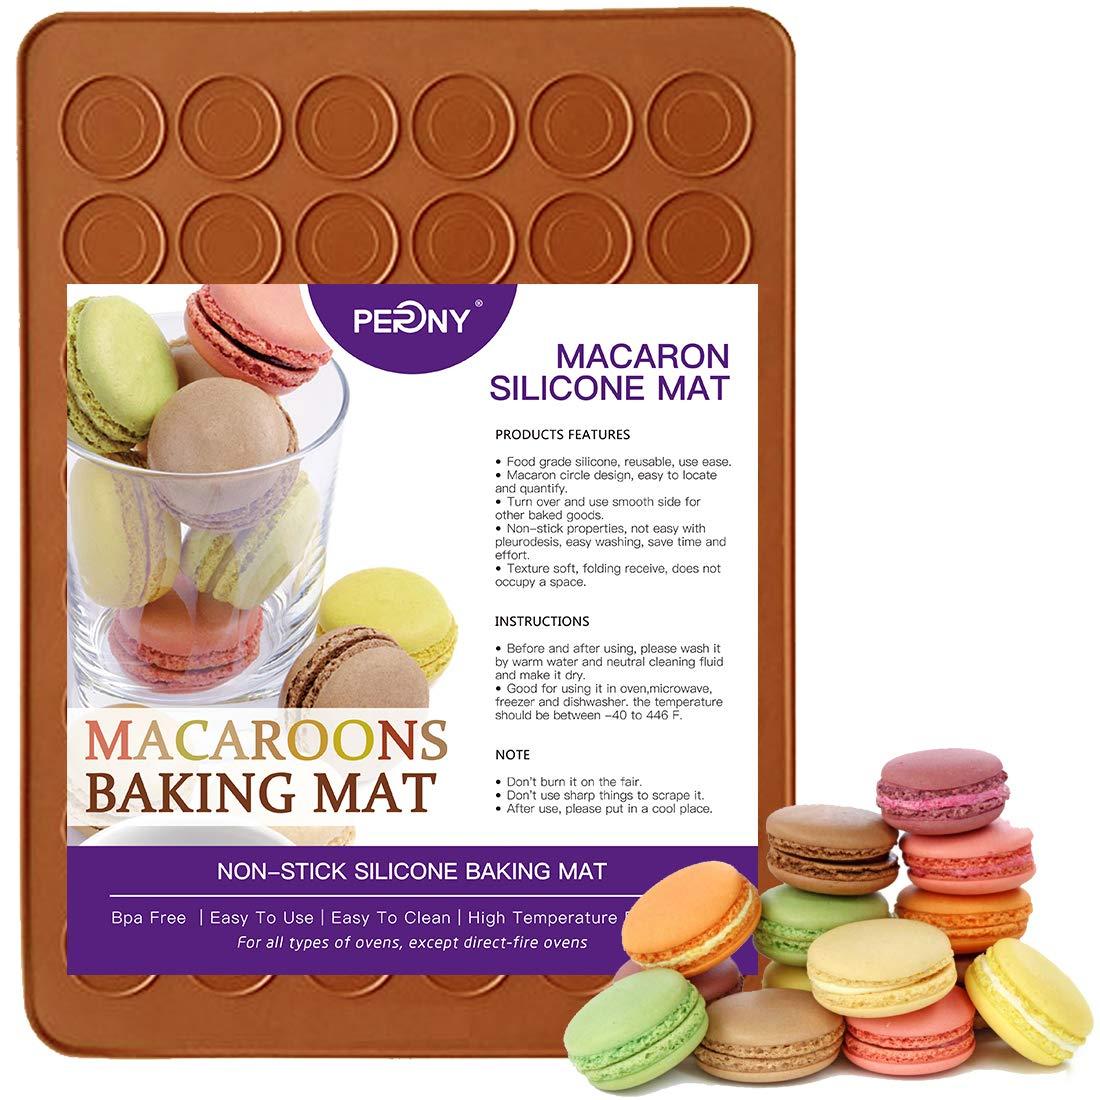 PERNY Macarons Silicone Mat, 48-Capacity Non-Stick Silicone Macarons Baking Mat for Baking 1.5″ Macarons, BPA free by PERNY